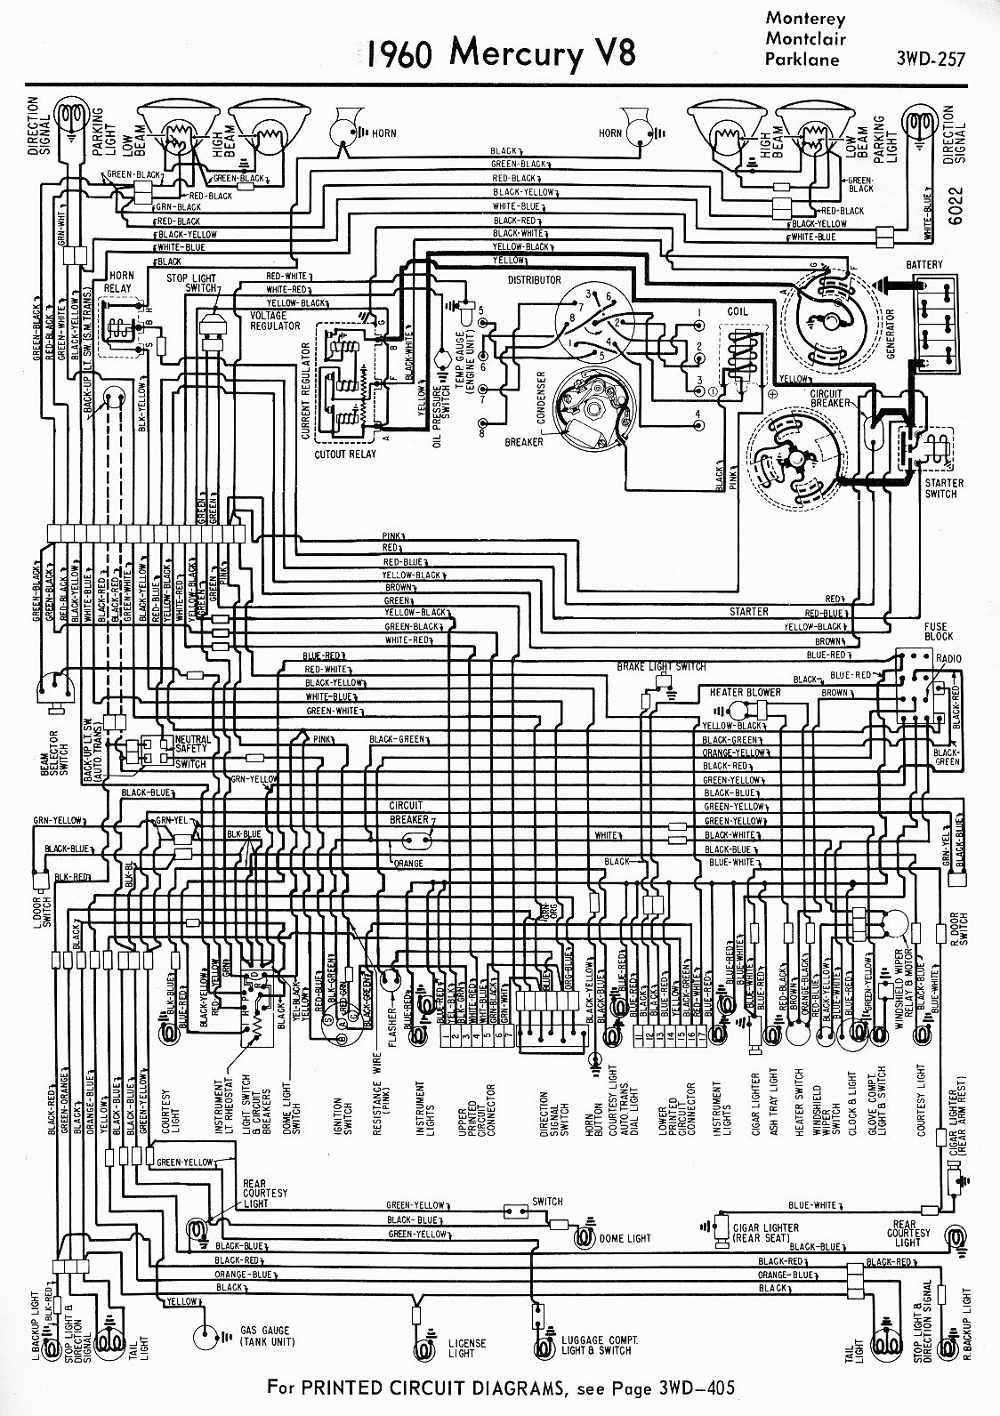 wiring diagrams of 1962 mercury 6 and v8 meteor wiring diagrams u2022 rh autonomia co